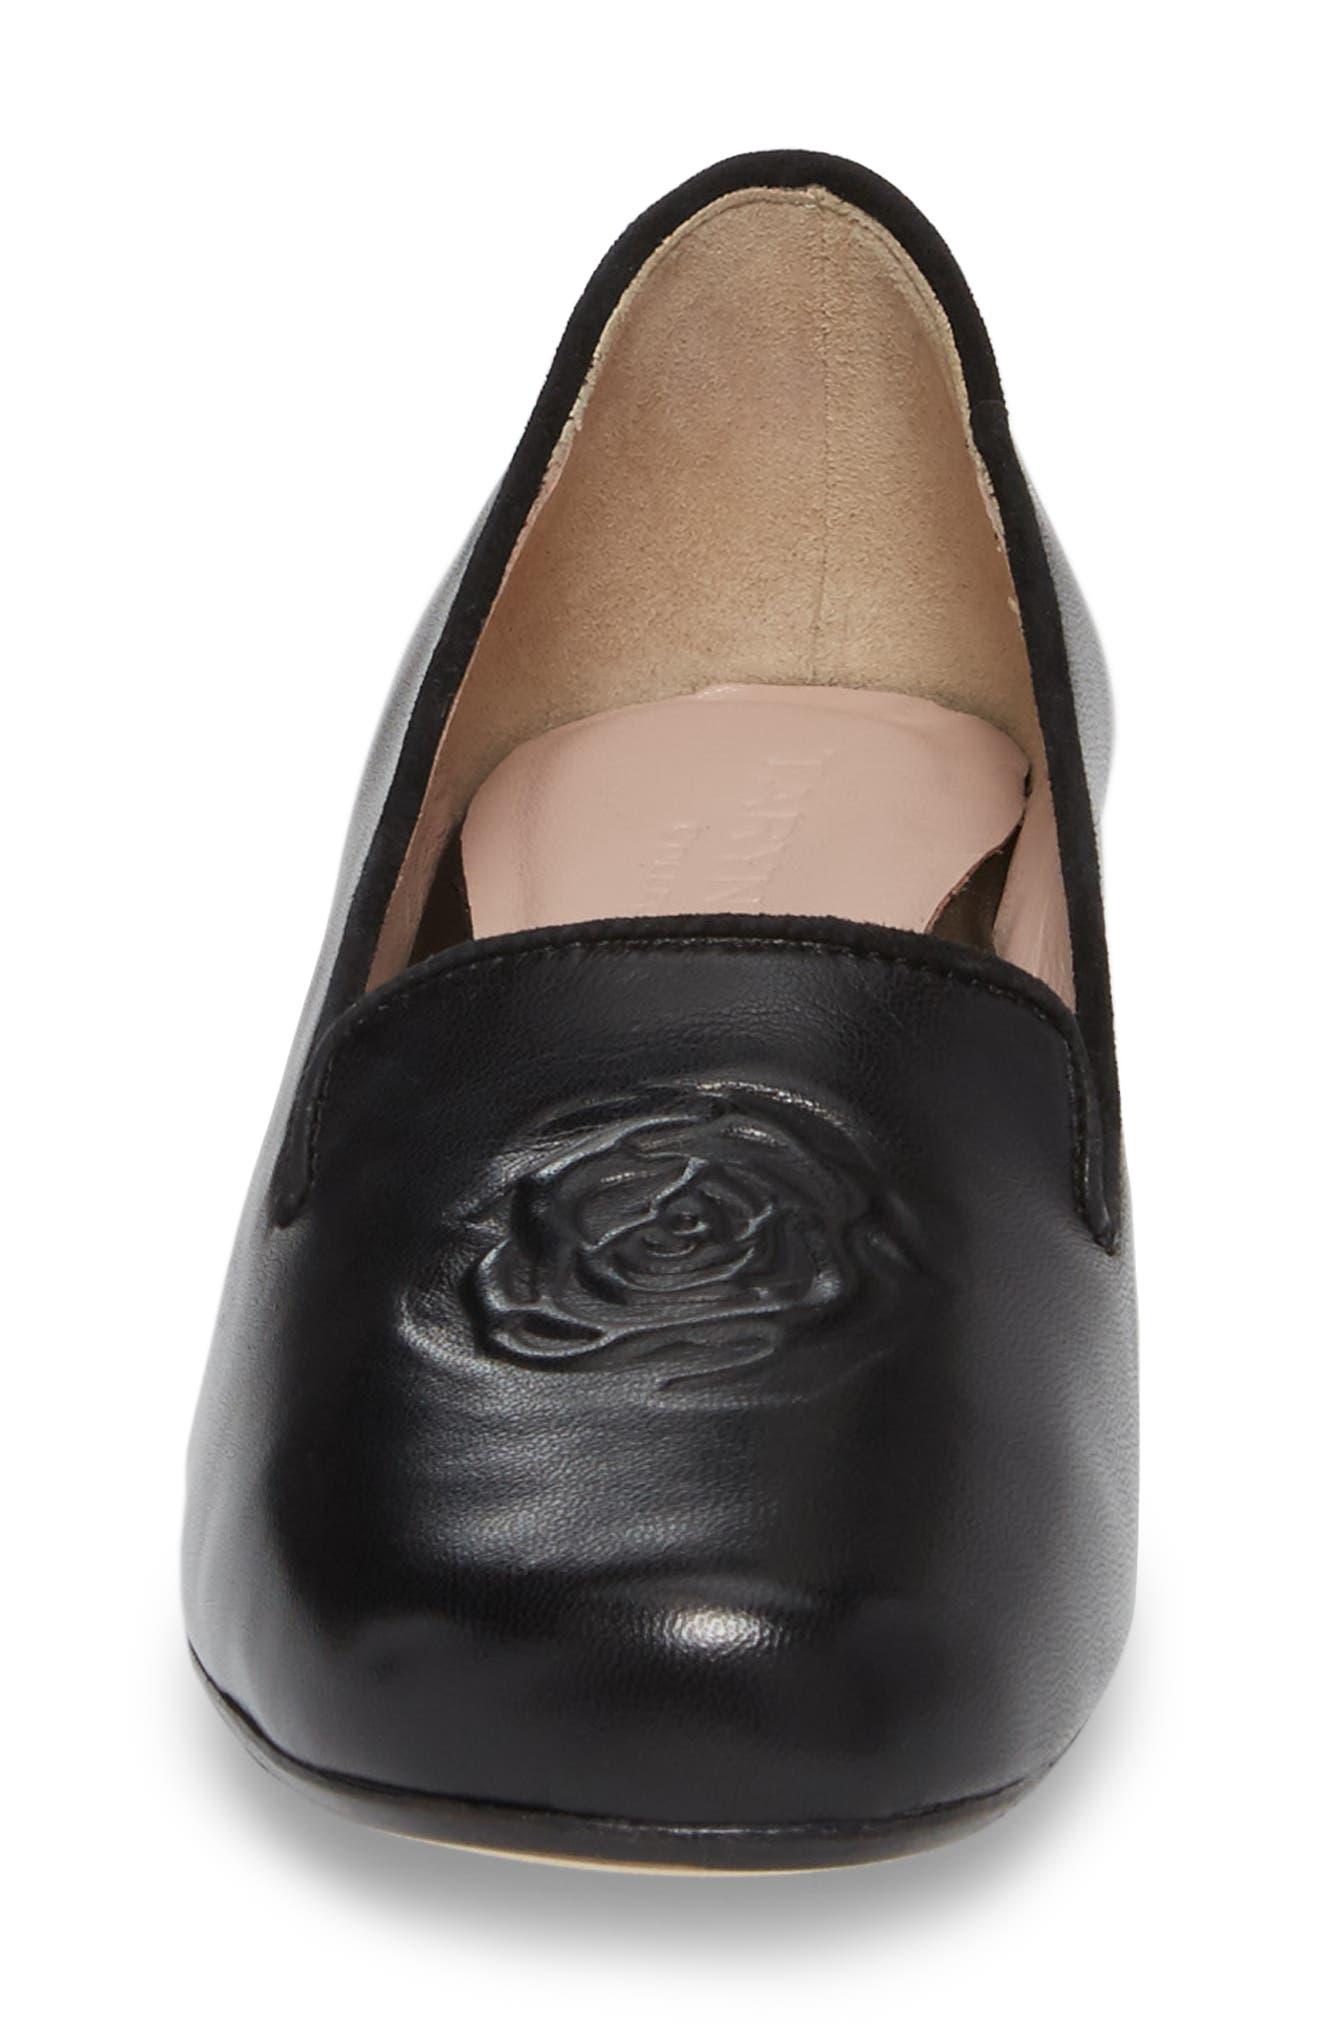 Taryn Rose Belissa Loafer,                             Alternate thumbnail 4, color,                             Black Leather